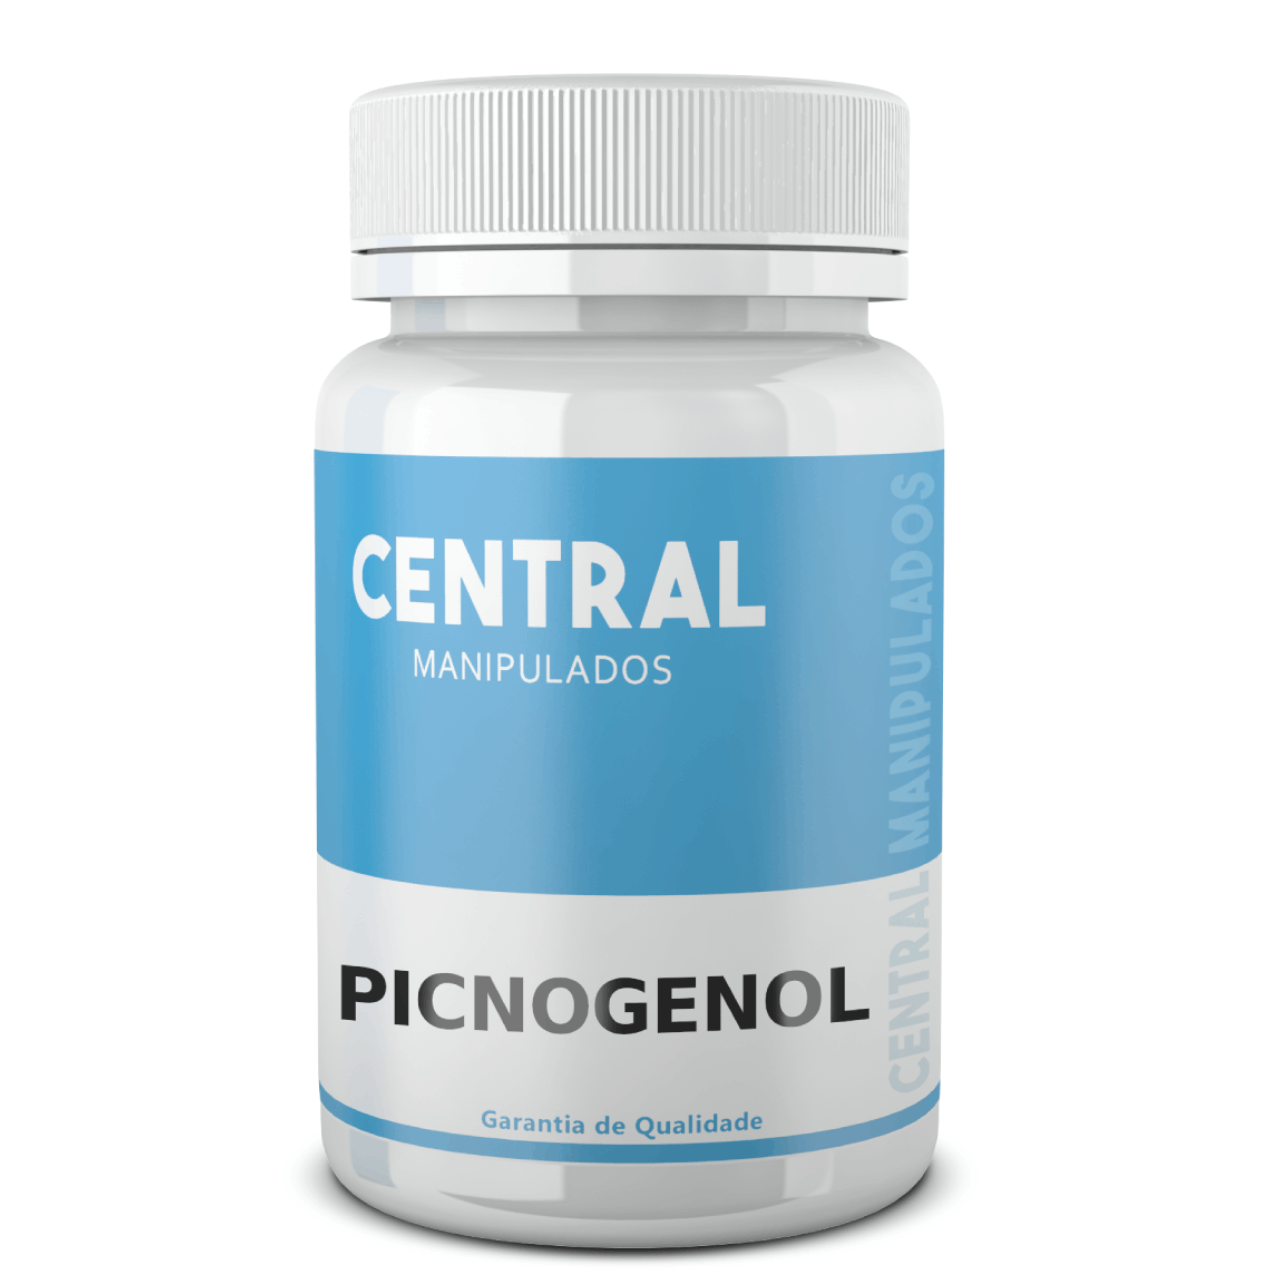 Picnogenol 150mg - 60 cápsulas - (pinus Pinaster) Pycnogenol - ANTIOXIDANTE